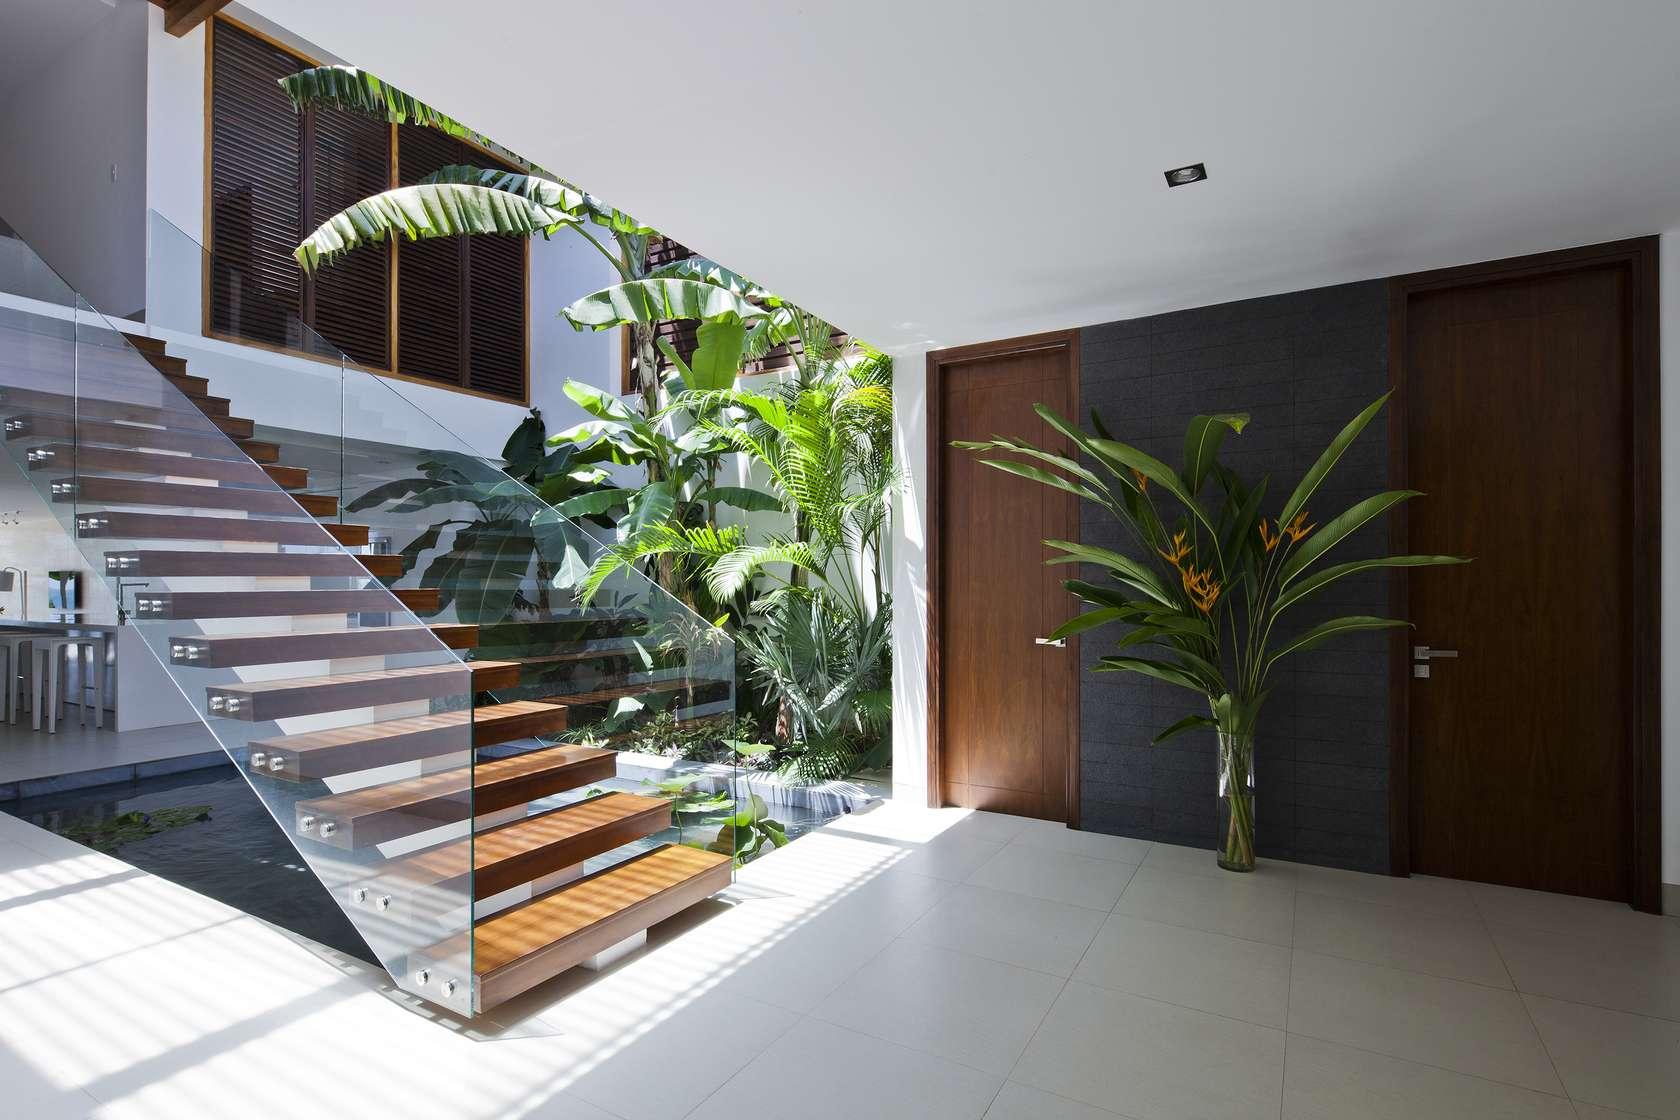 Home Interior Entrance Design Ideas: Private-entrance-design